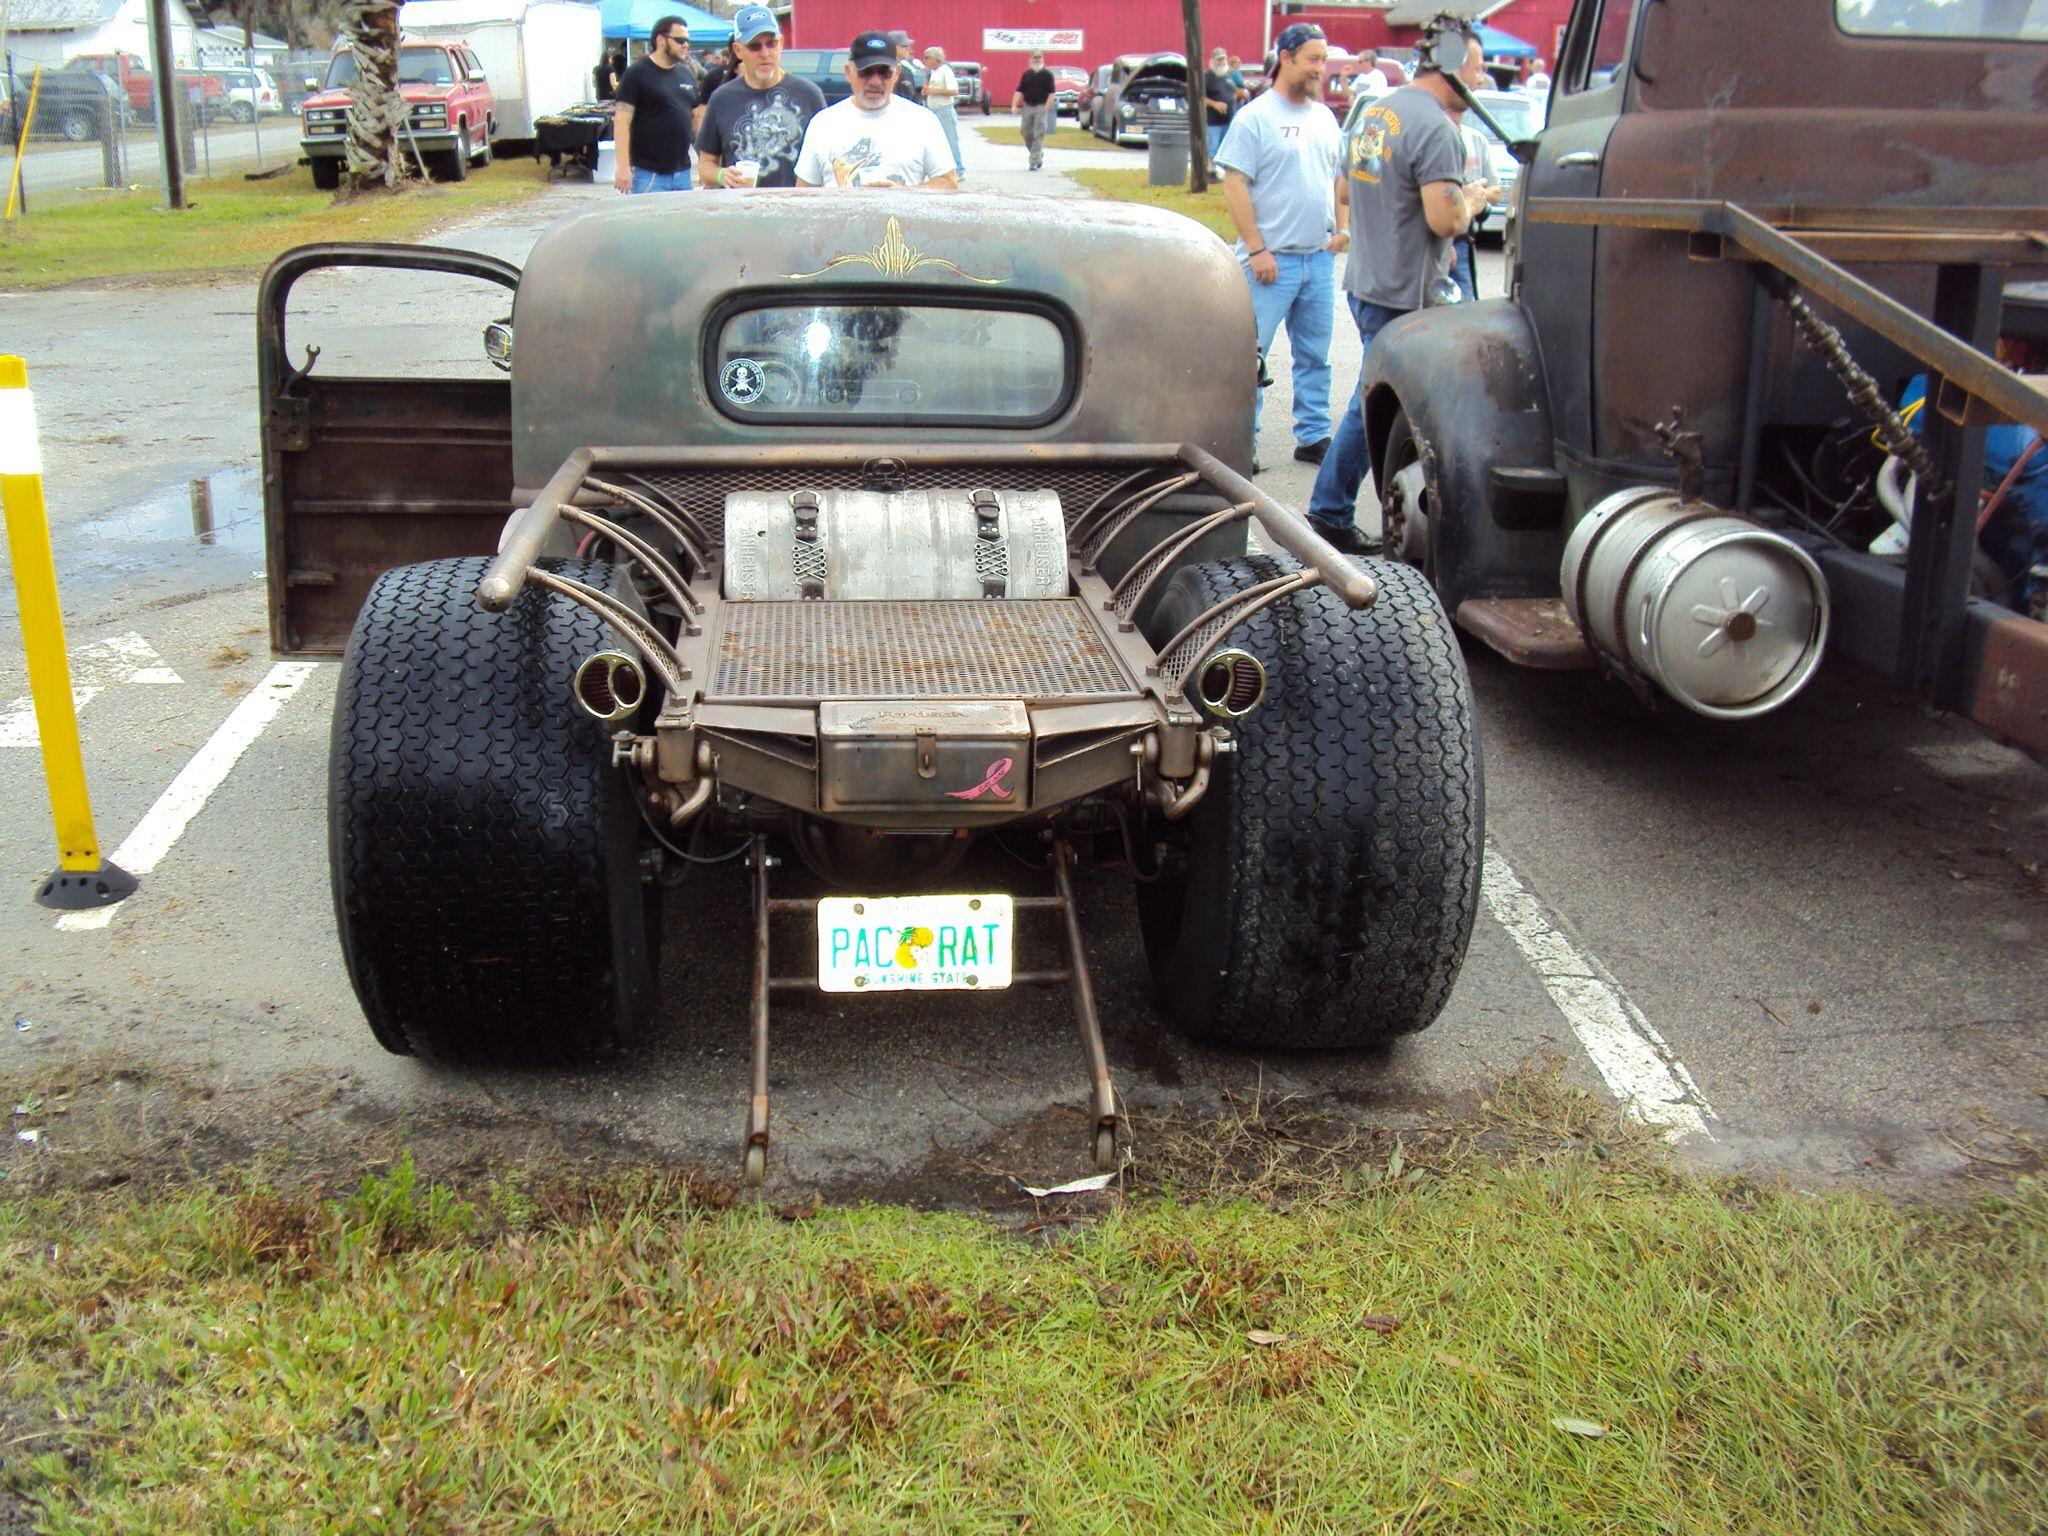 Car show in Sanford Fl